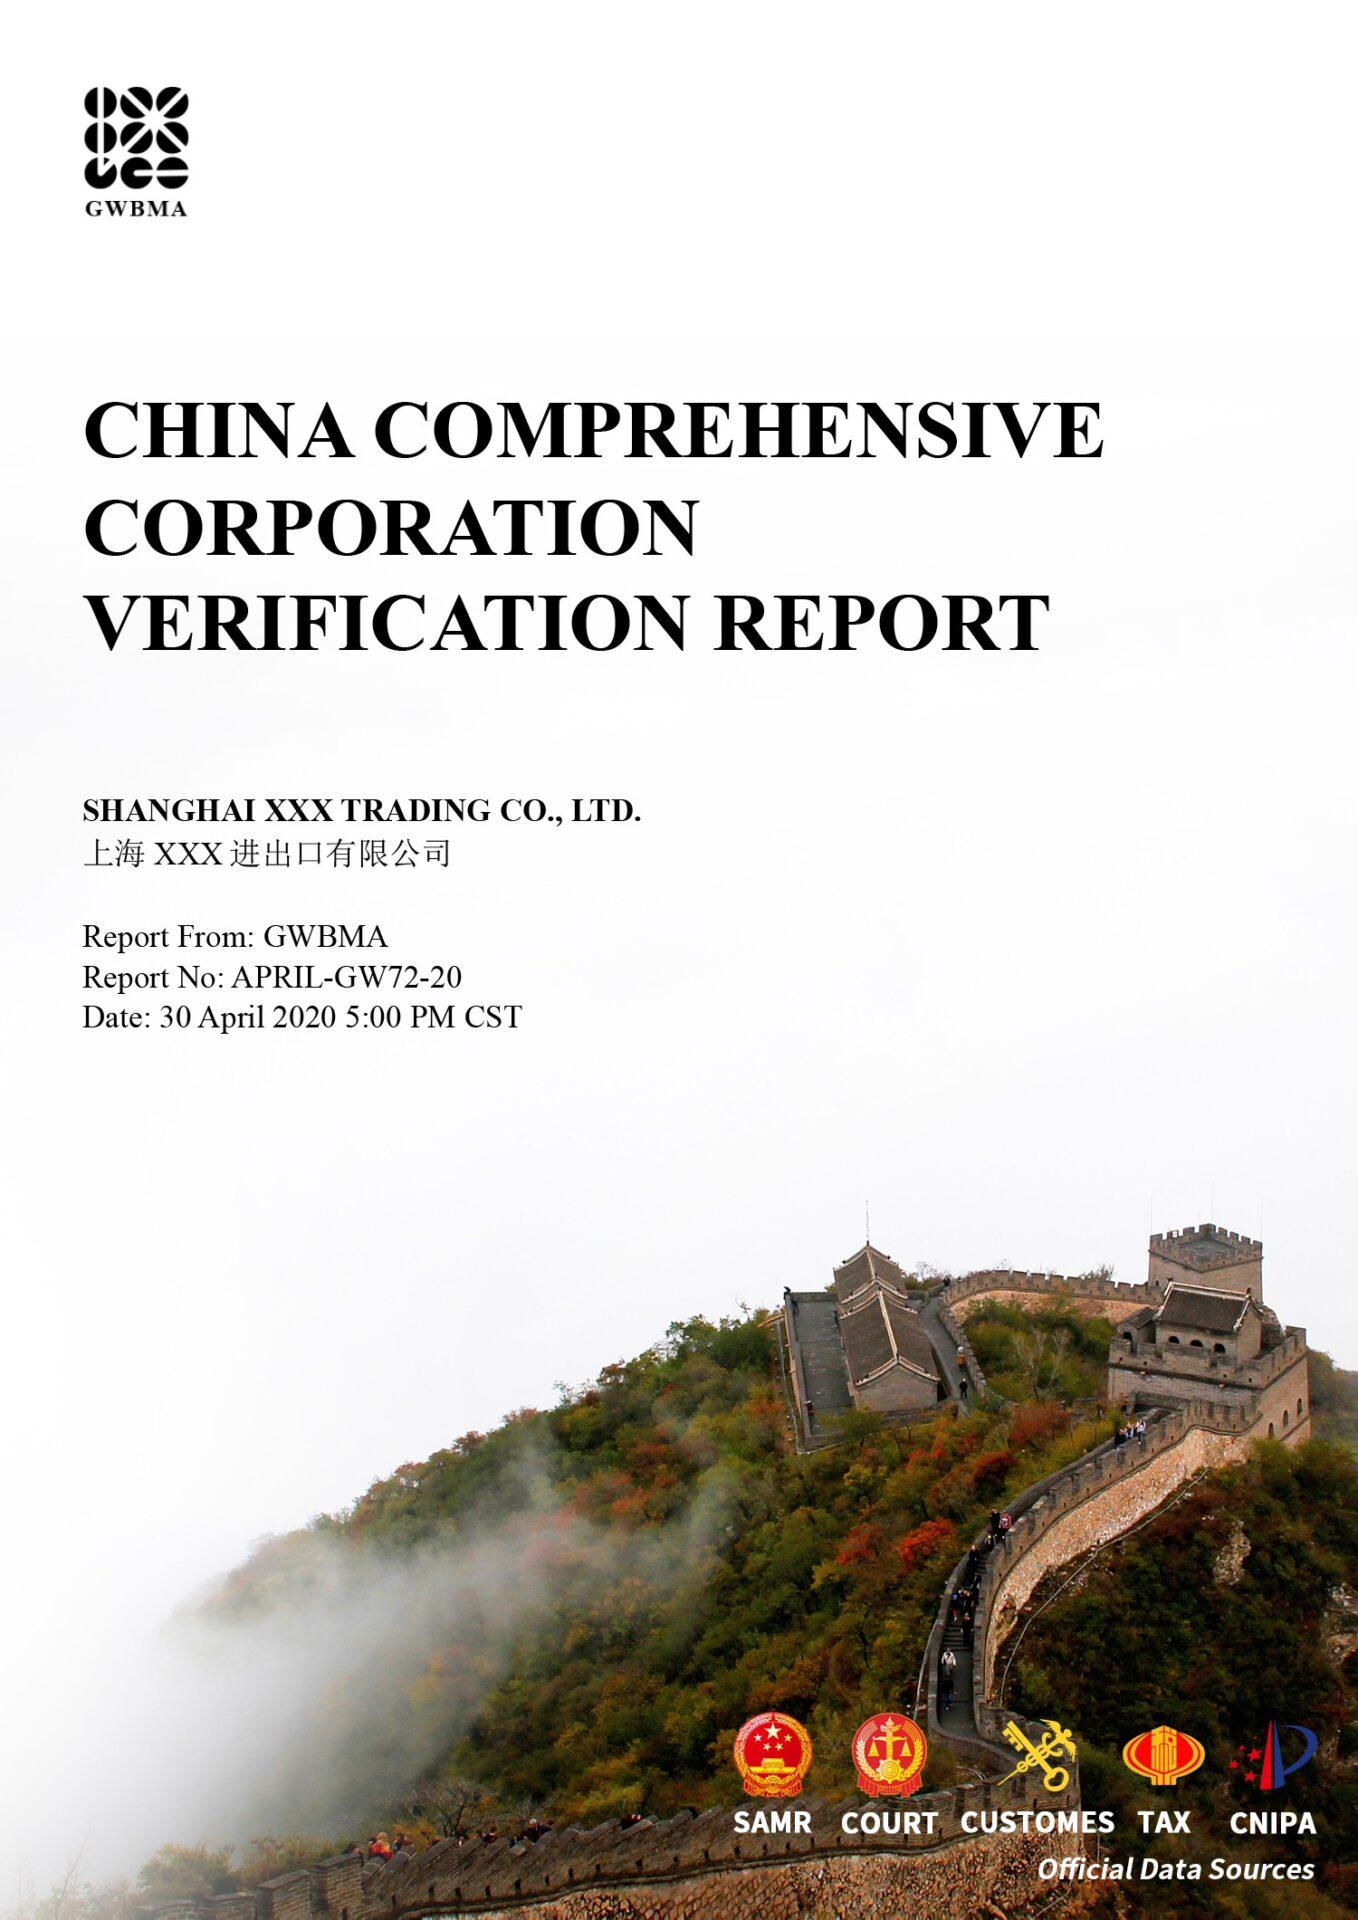 China Comprehensive Corporation Verification Report (1)